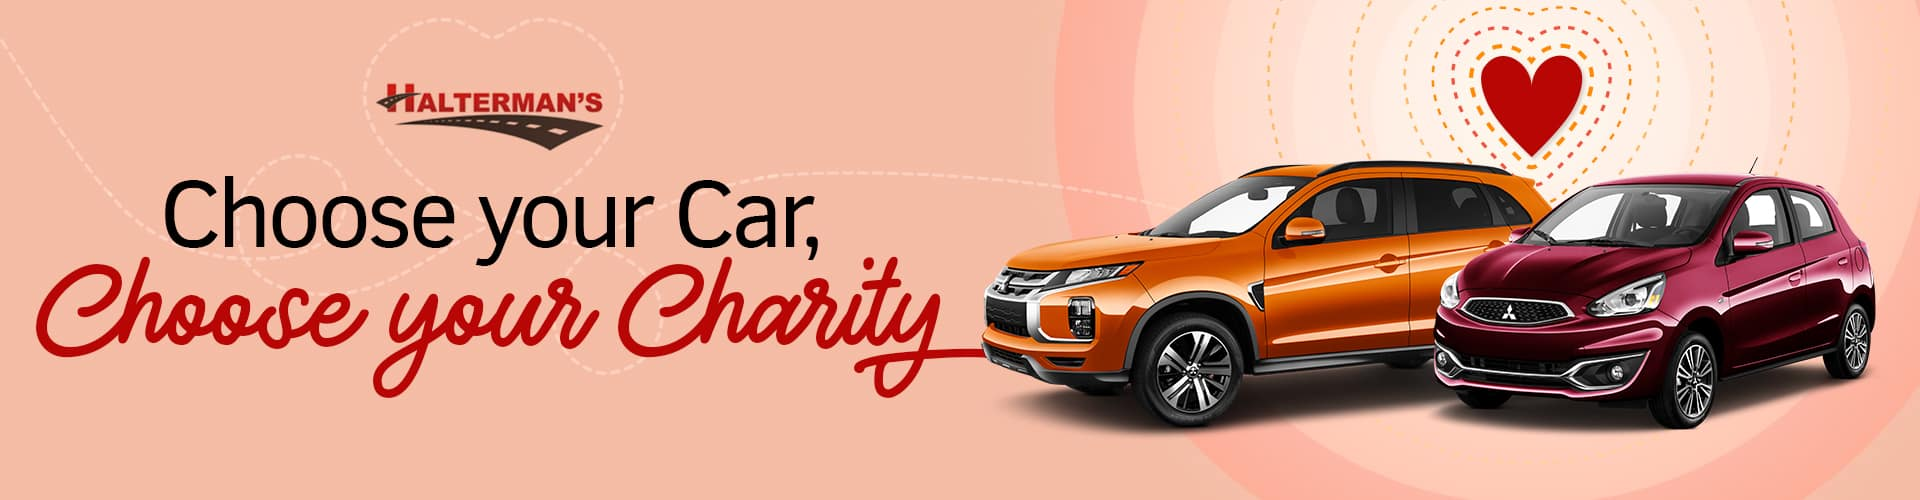 Choose Your Charity at Halterman's Mitsubishi